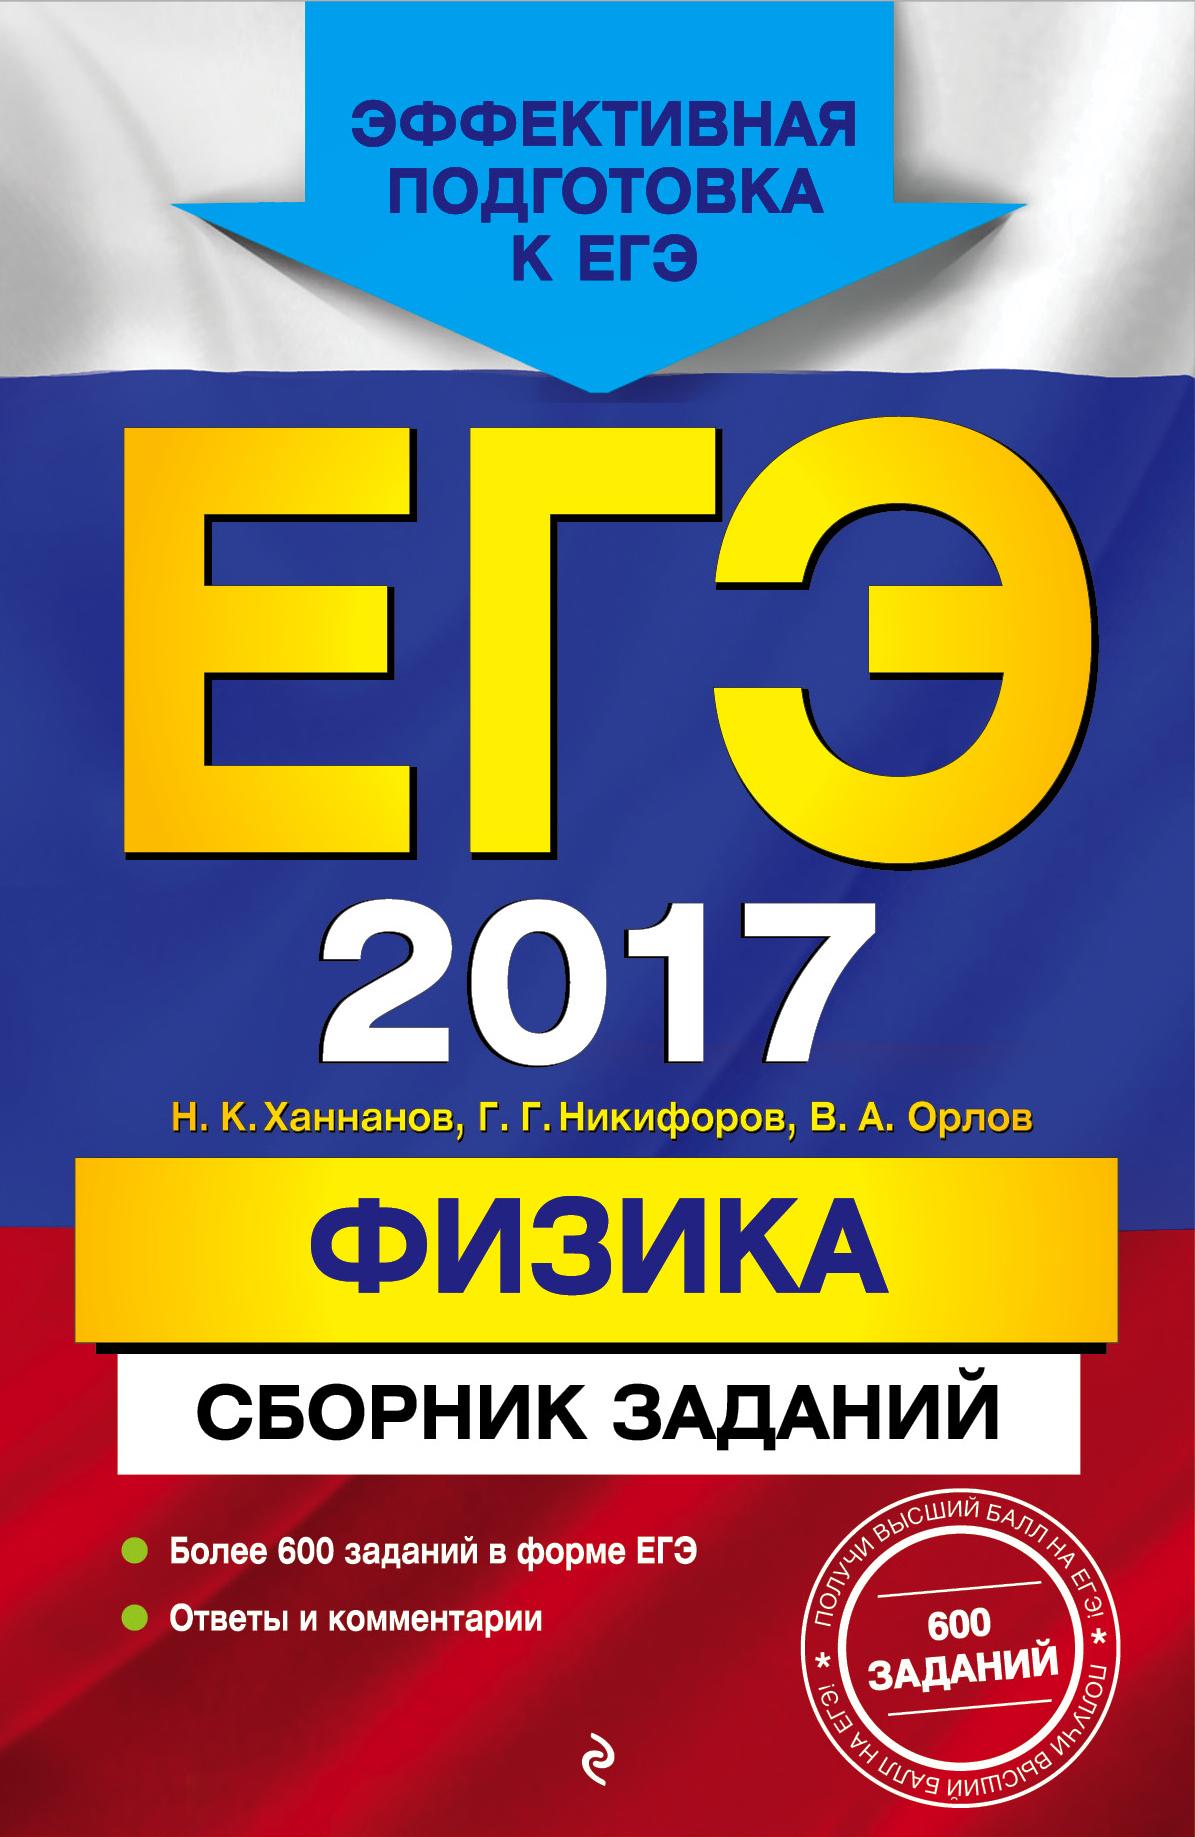 ЕГЭ-2017. Физика. Сборник заданий от book24.ru